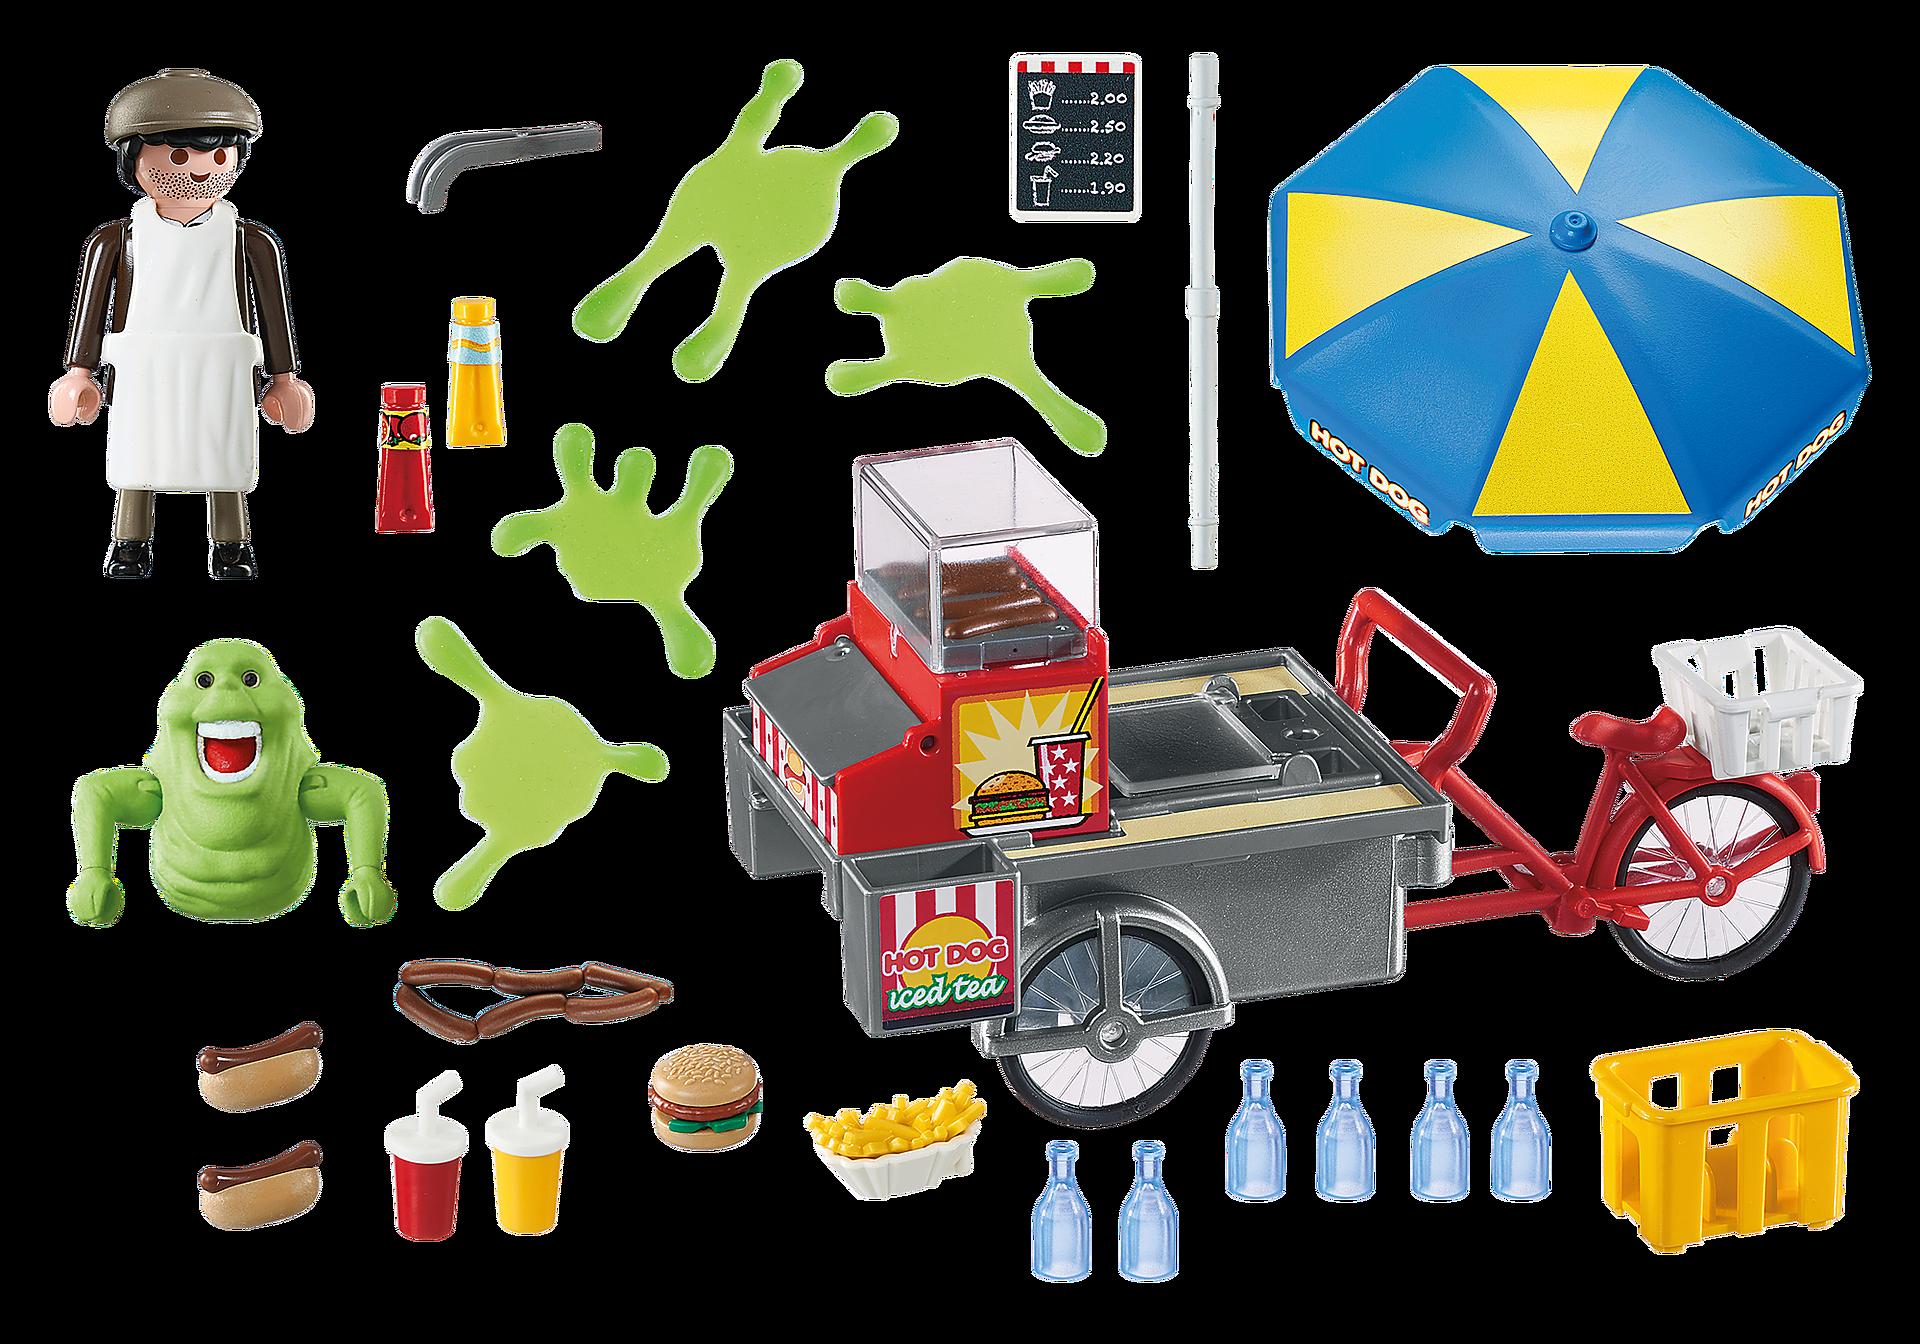 9222 Slimer con Stand de Hot Dog zoom image4